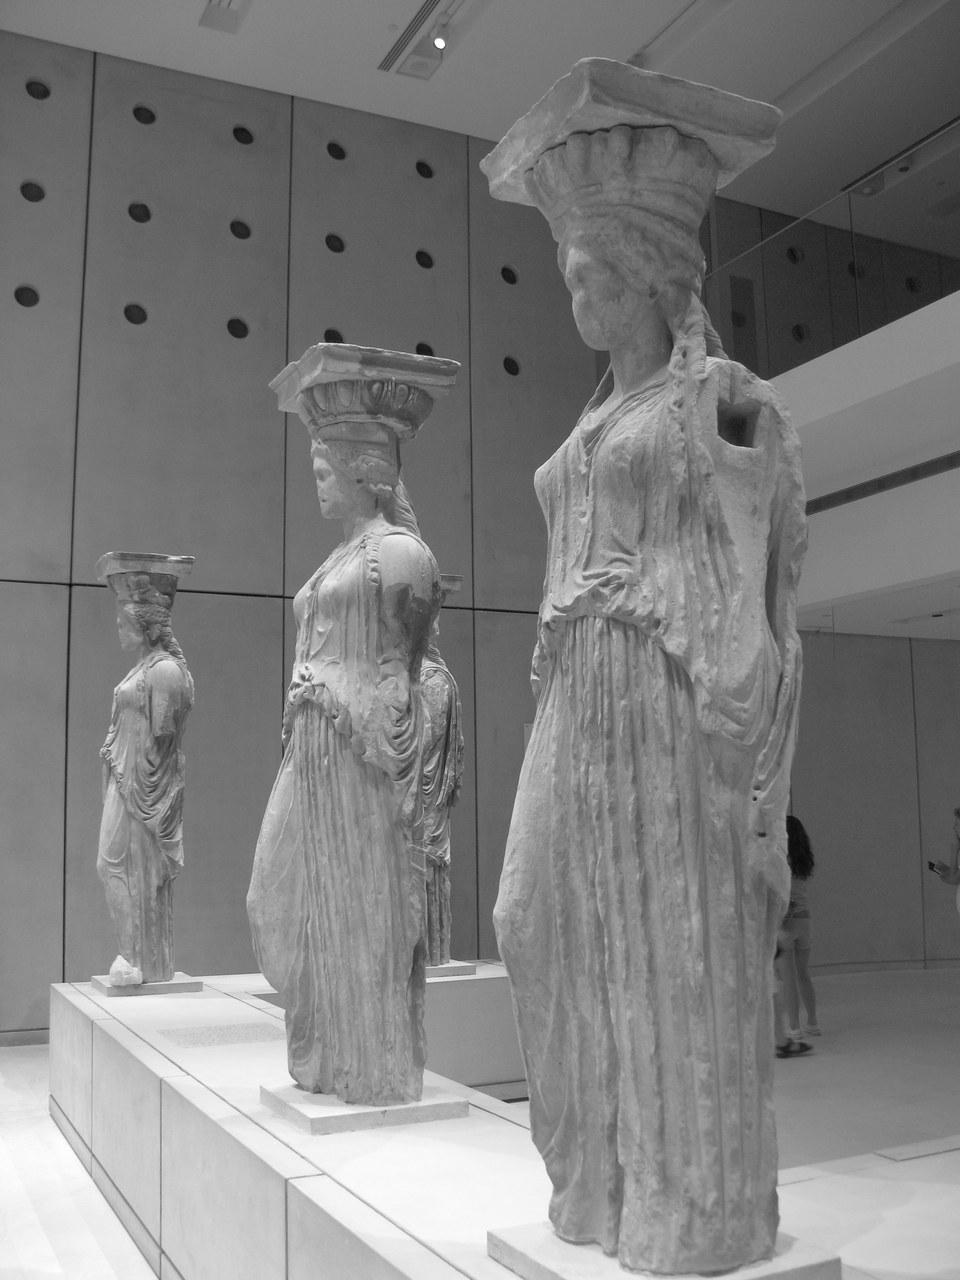 Cariatidi dell'Eretteo dell'Acropoli nel museo Archeologico di Atene © Tilemahos Efthimiadis – This file is licensed under the Creative Commons Attribution-Share Alike 2.0 Generic license